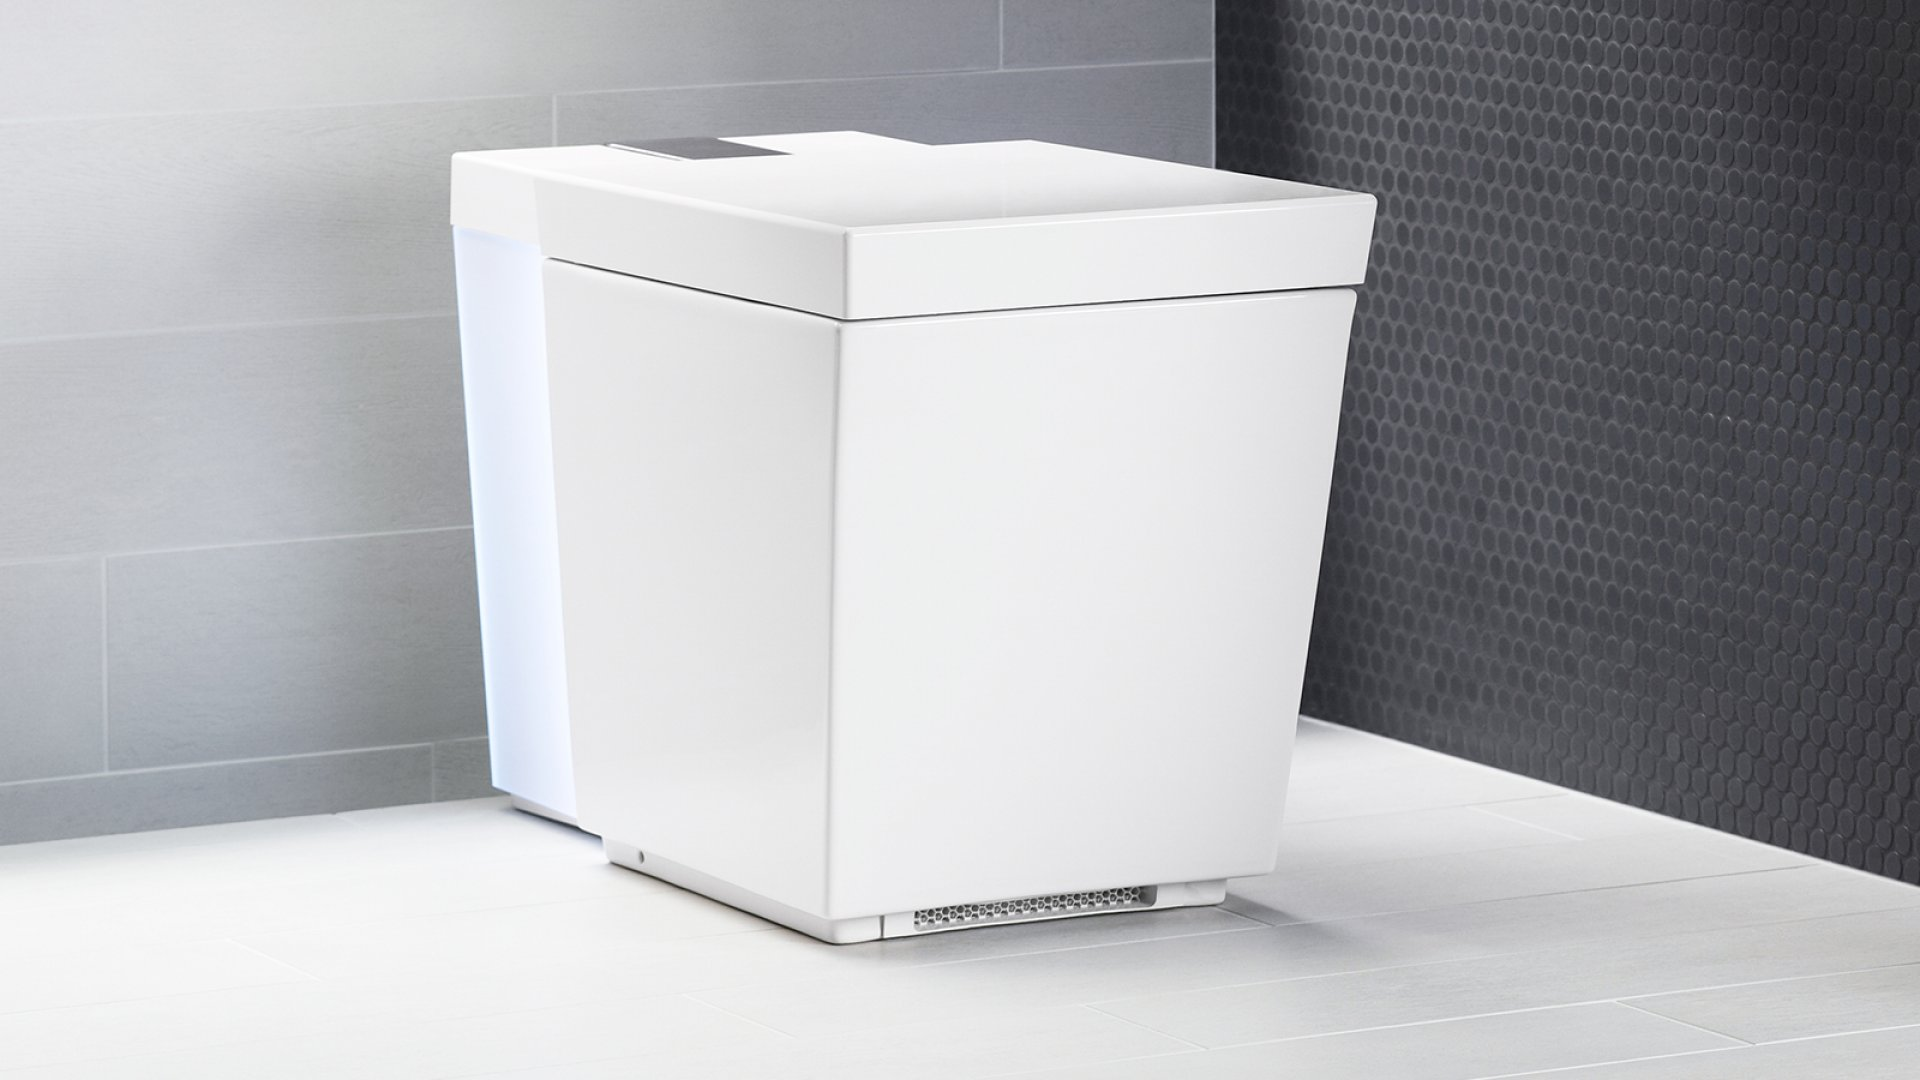 Kohler's Numi smart toilet.